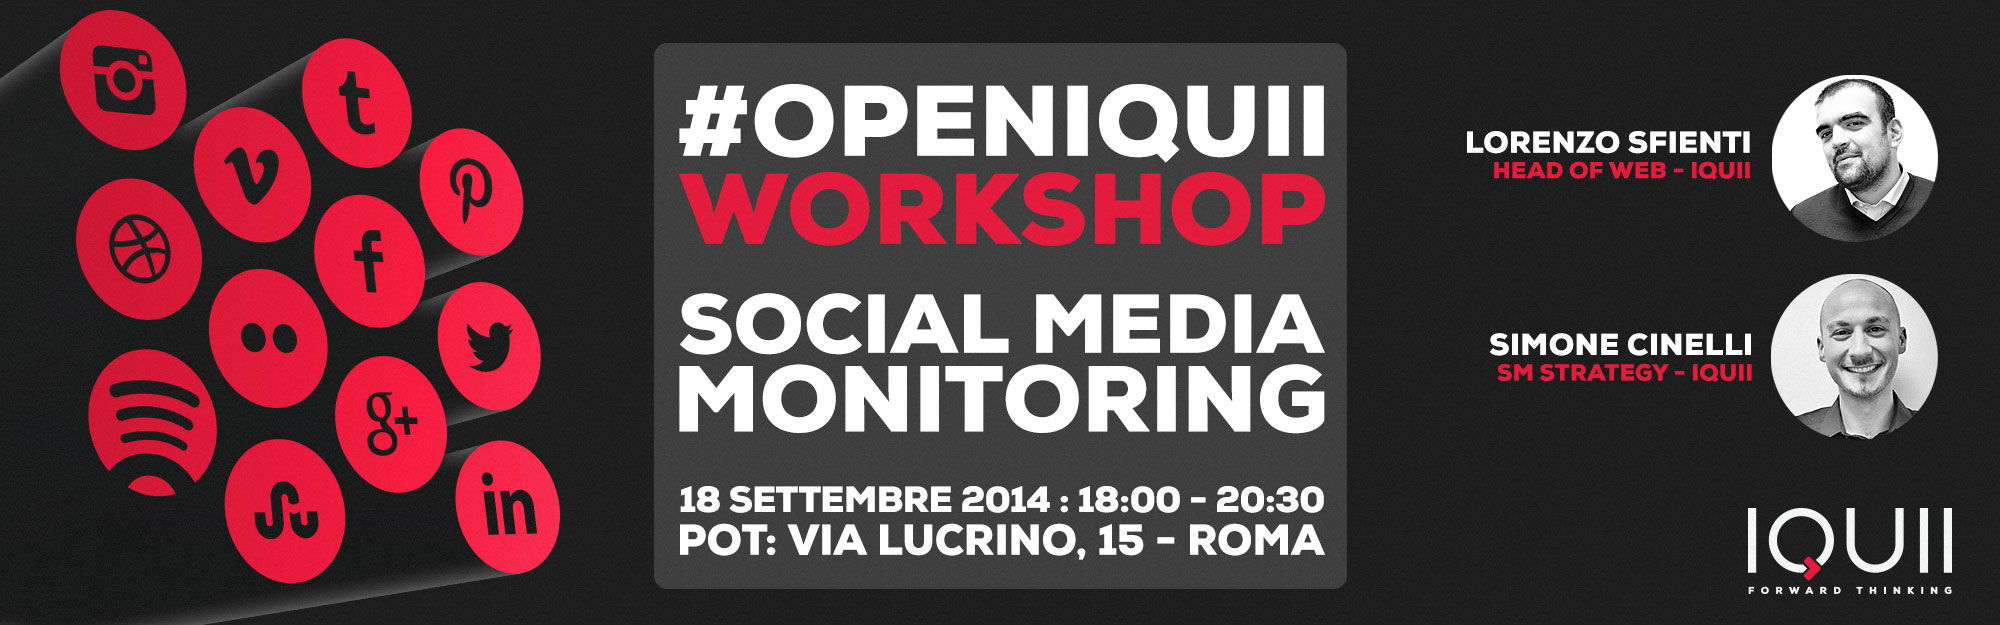 #OpenIQUII – Workshop Social Media Monitoring